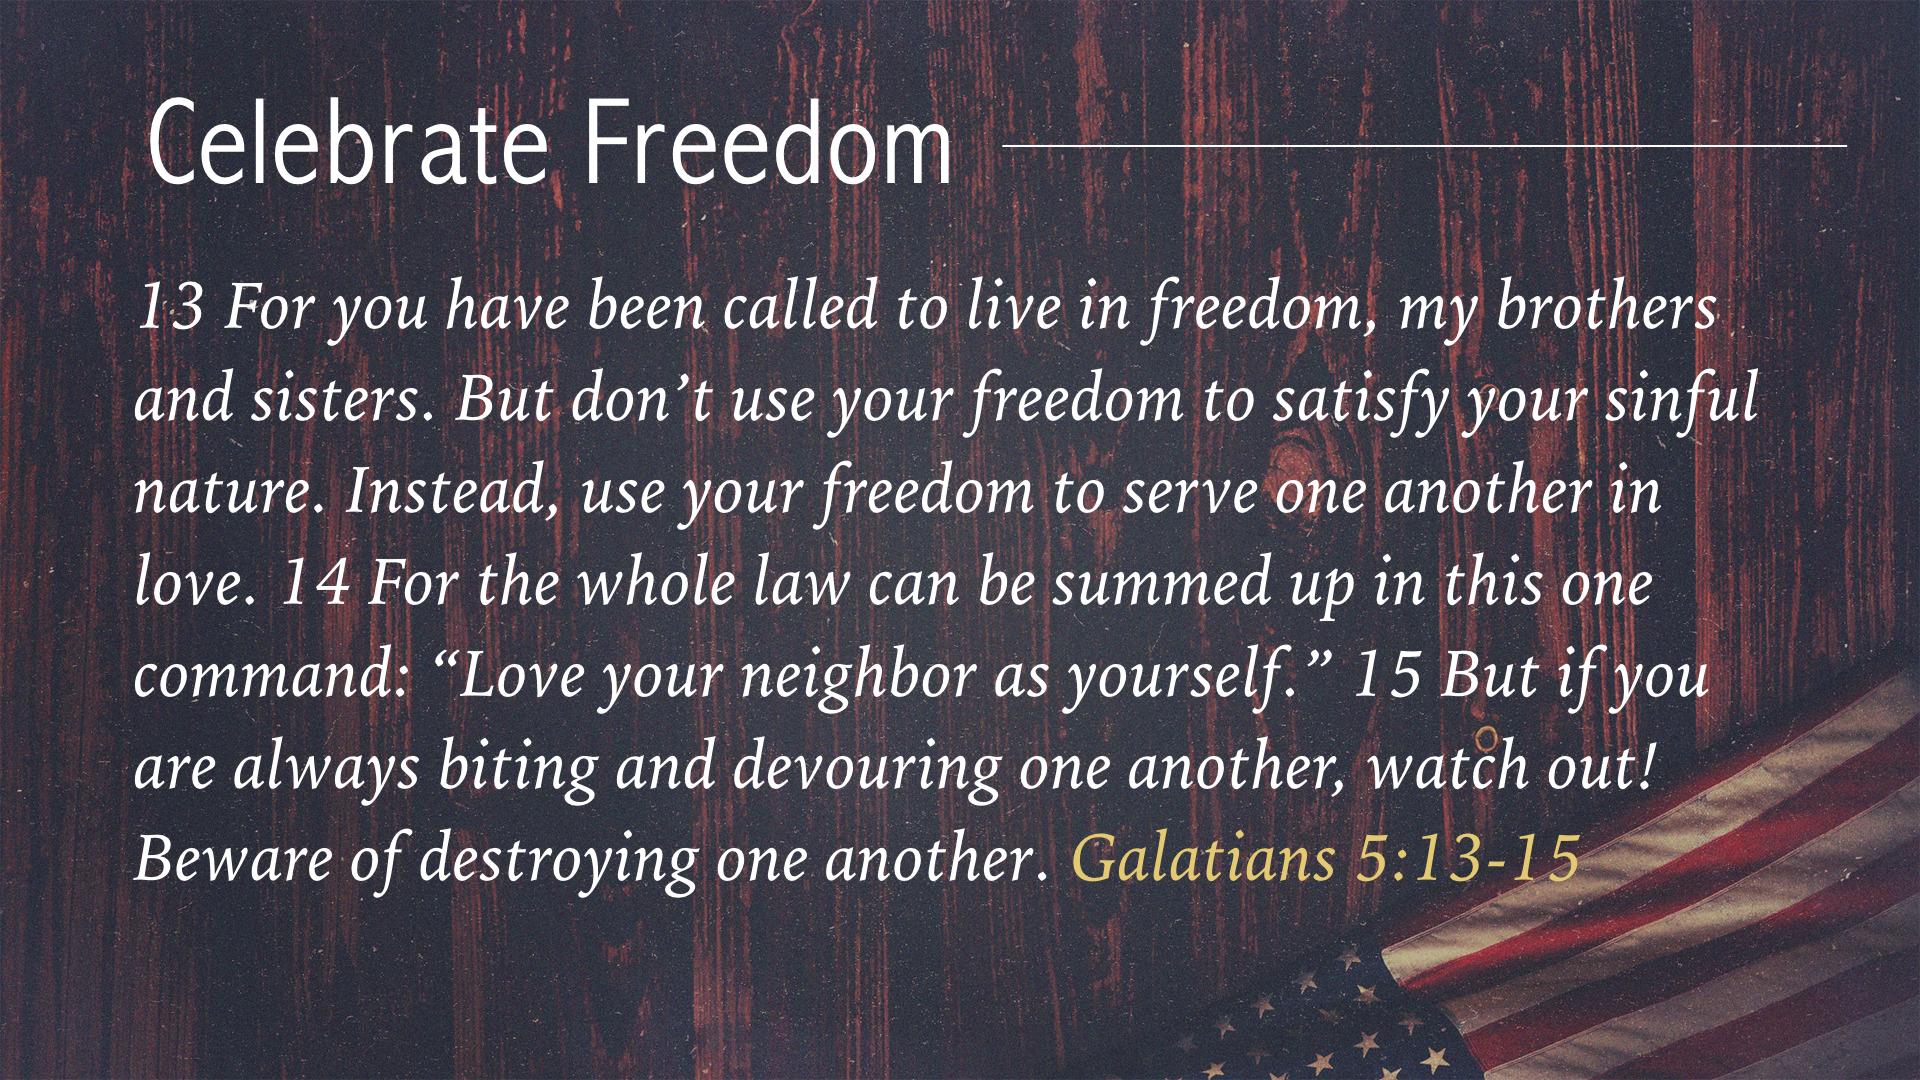 Celebrate Freedom July 3 2016.009